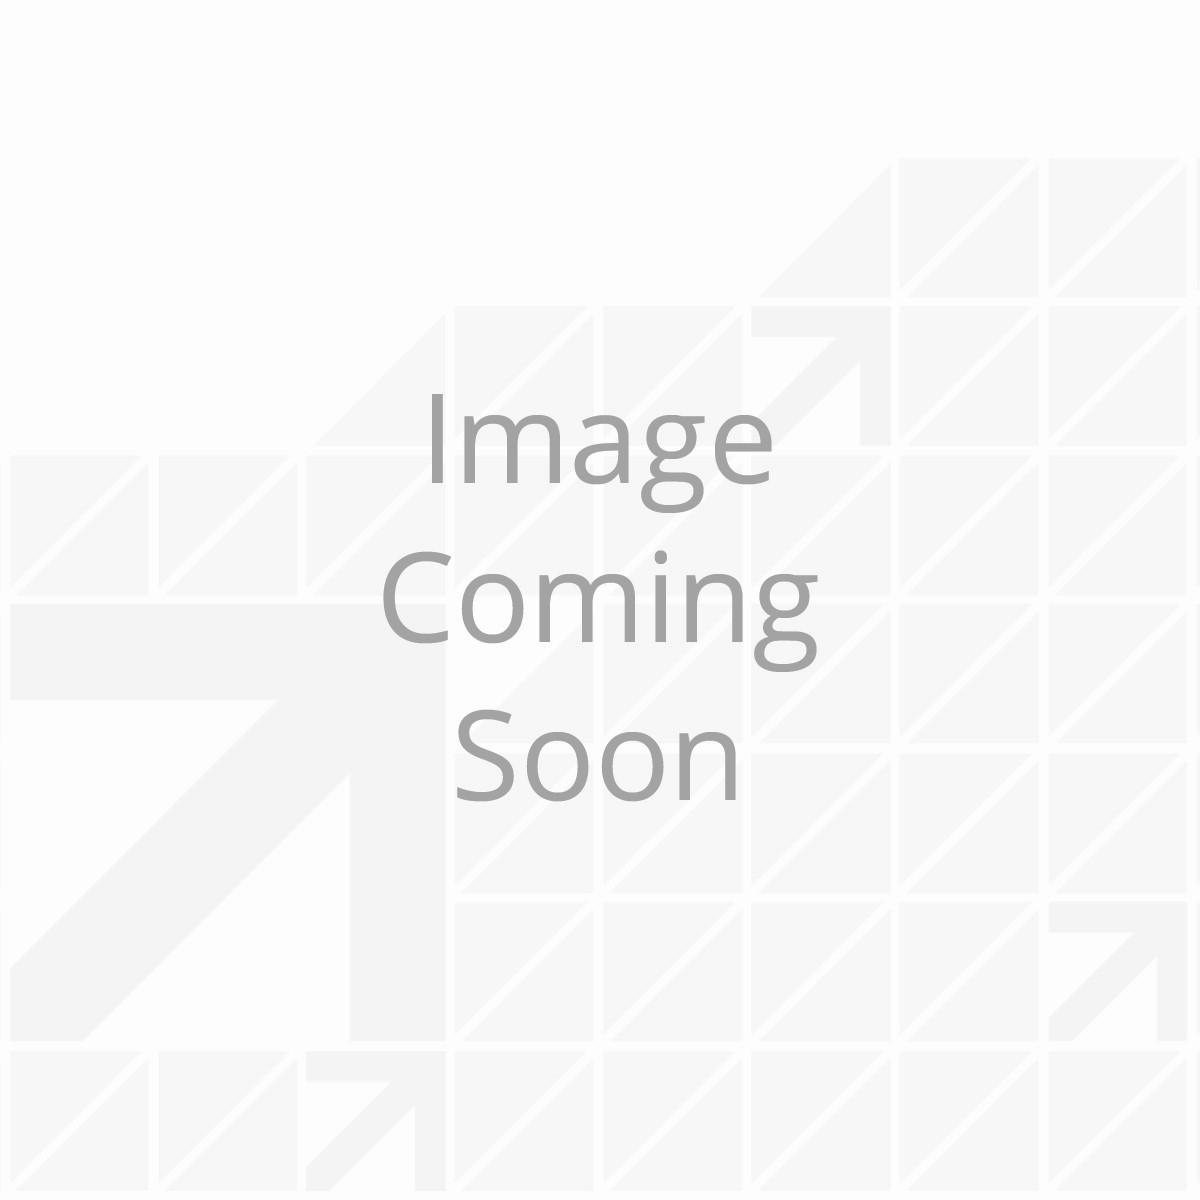 359462_-_pg_leveling_service_kit_-_001